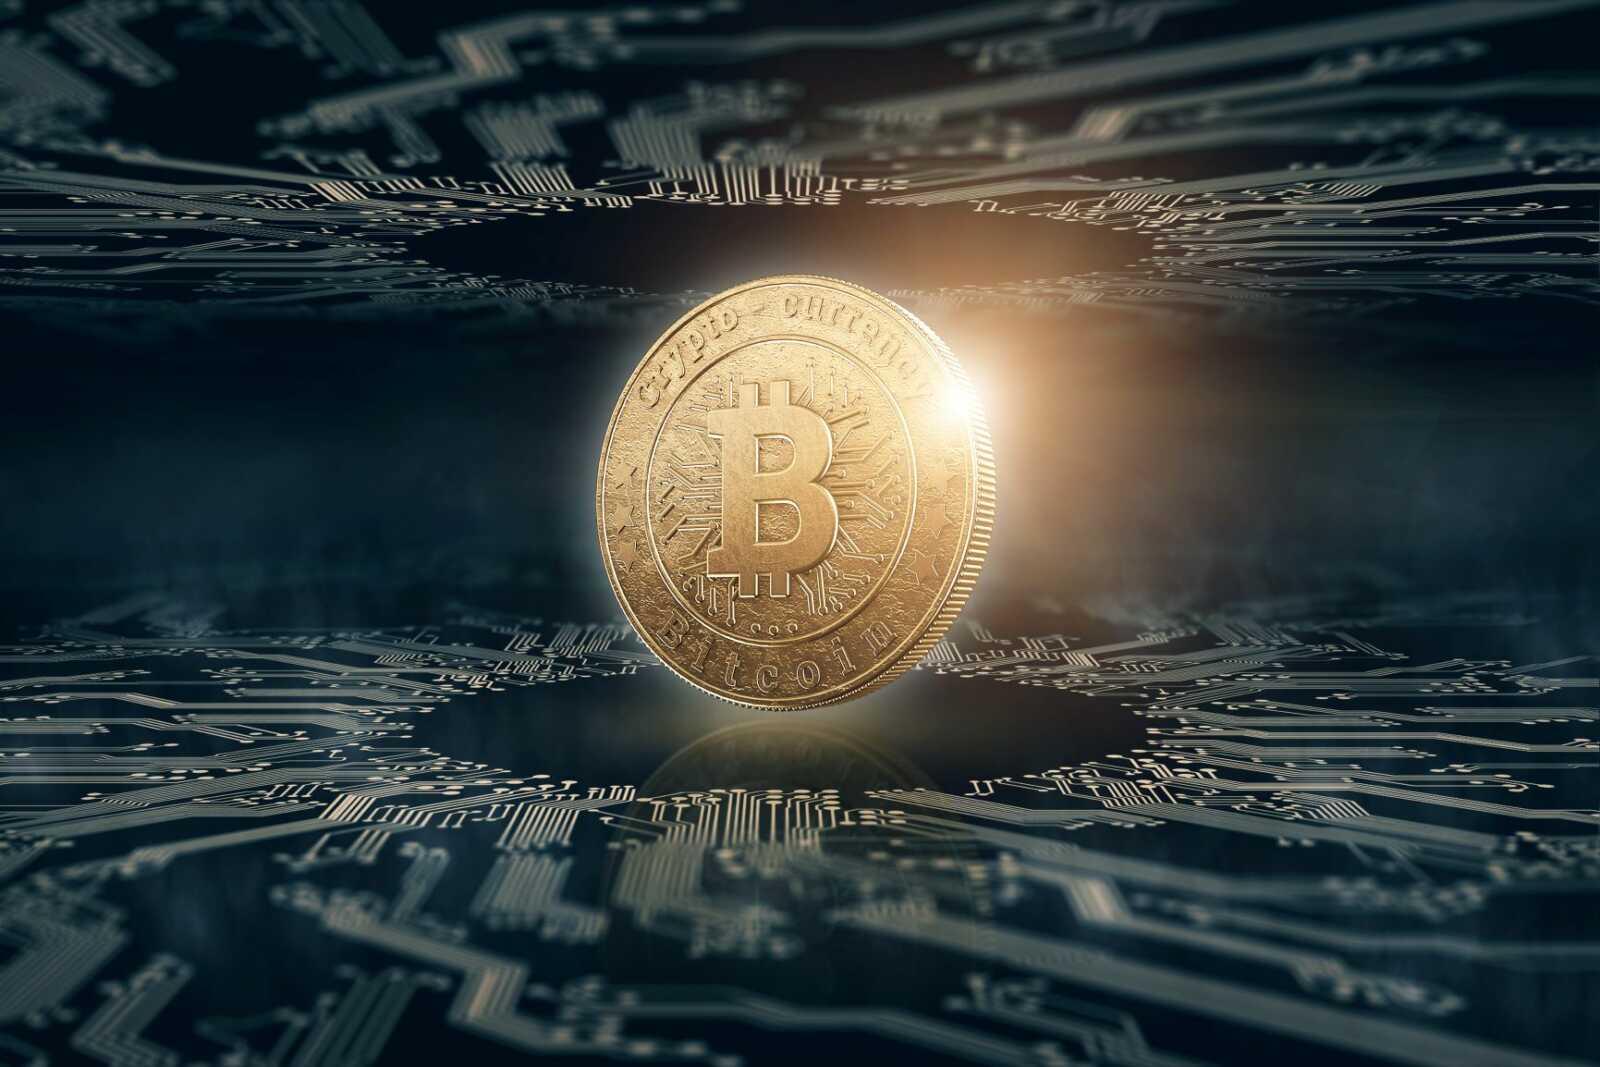 pantera capital bitcoin agustos 2021e kadar 115 000 dolara yukselecek 6021187b50d73